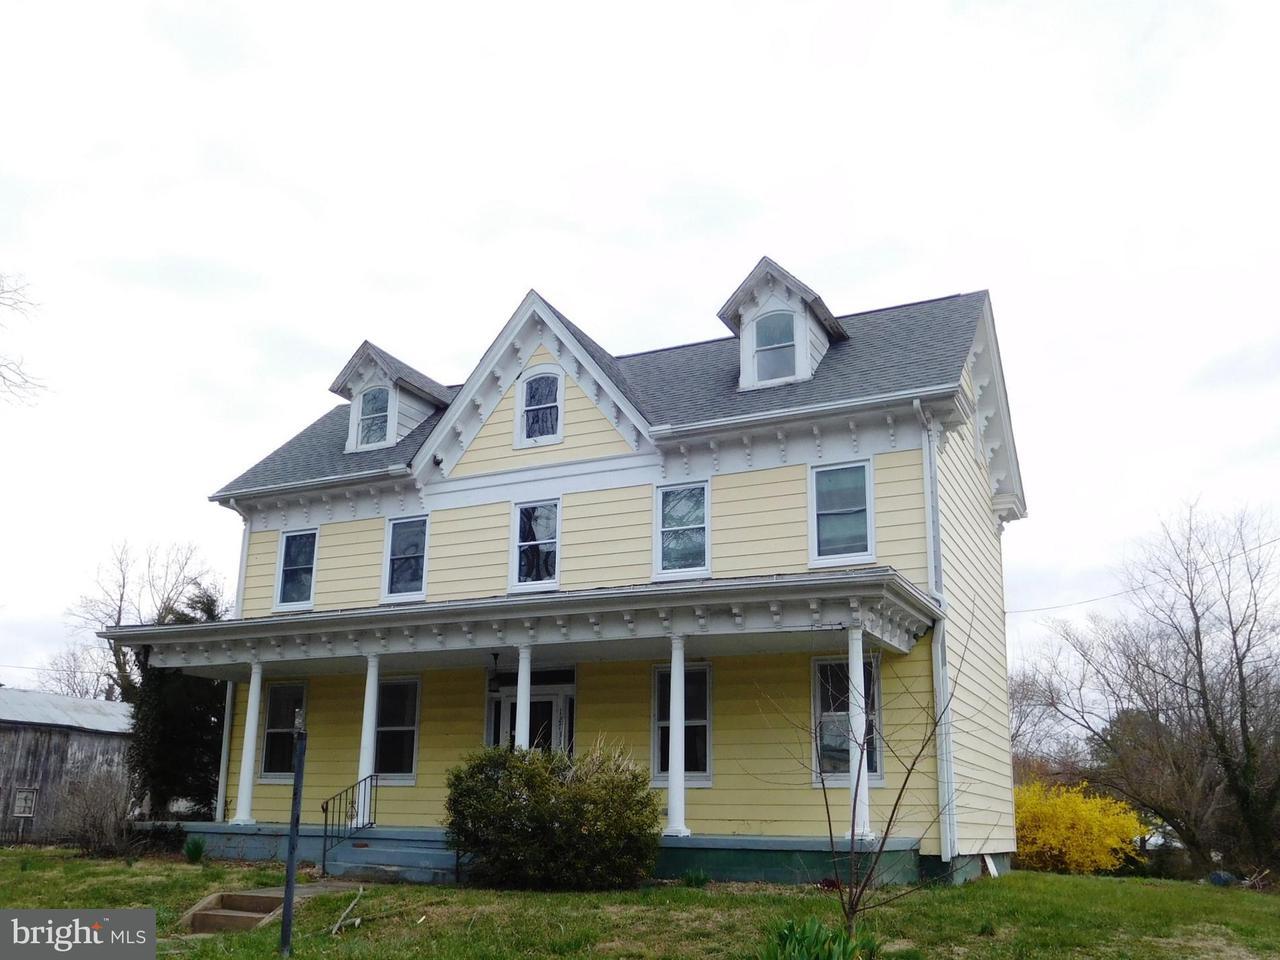 Single Family for Sale at 12733 Still Pond Rd Still Pond, Maryland 21667 United States